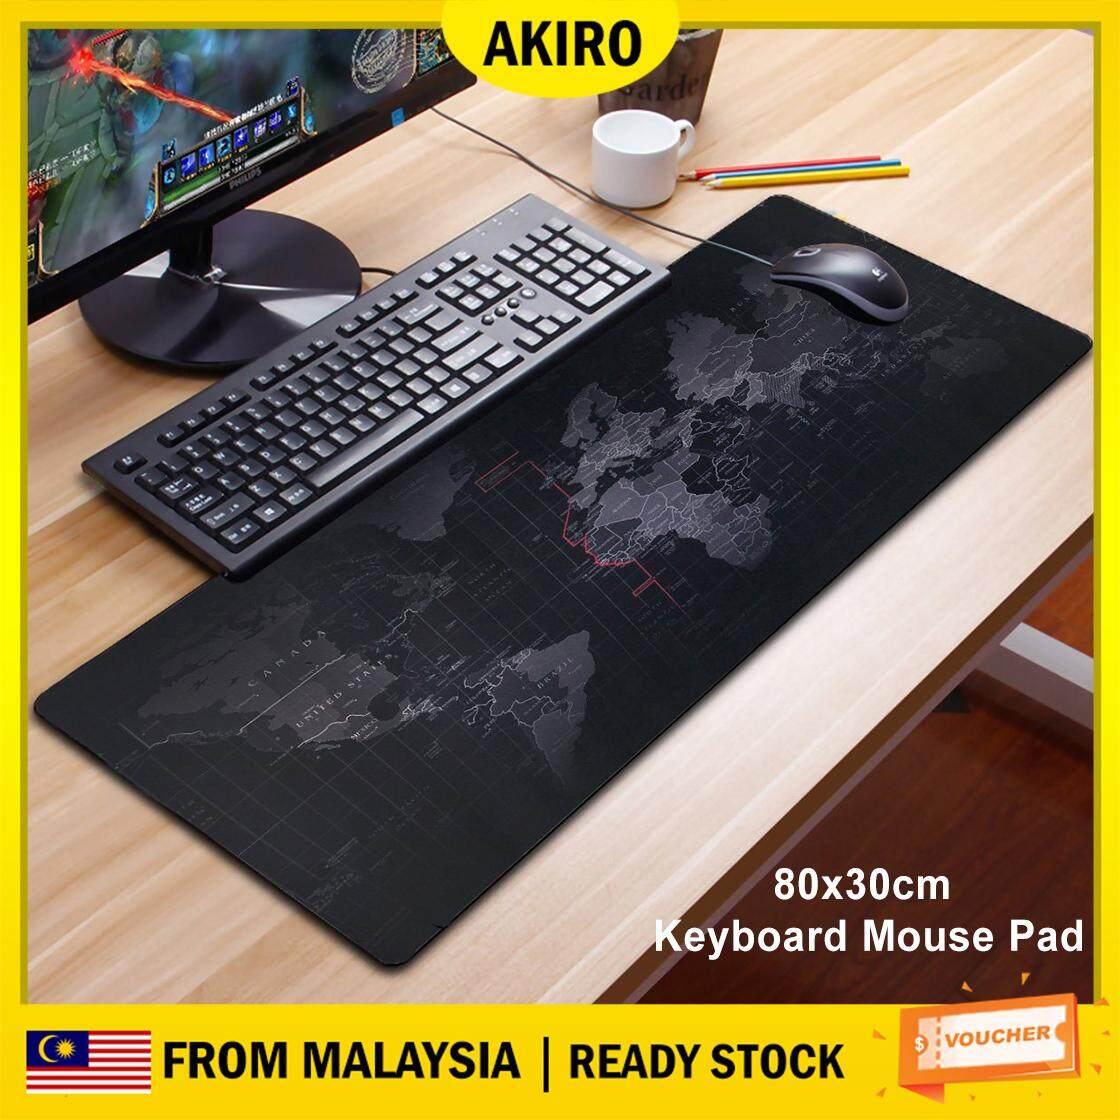 AKIRO 80cm Extra Large Non-Slip Rubber Base Gaming World Map Desktop Laptop Consoles Keyboard Mouse Pad Mousepad Dota LOL CS GO Malaysia